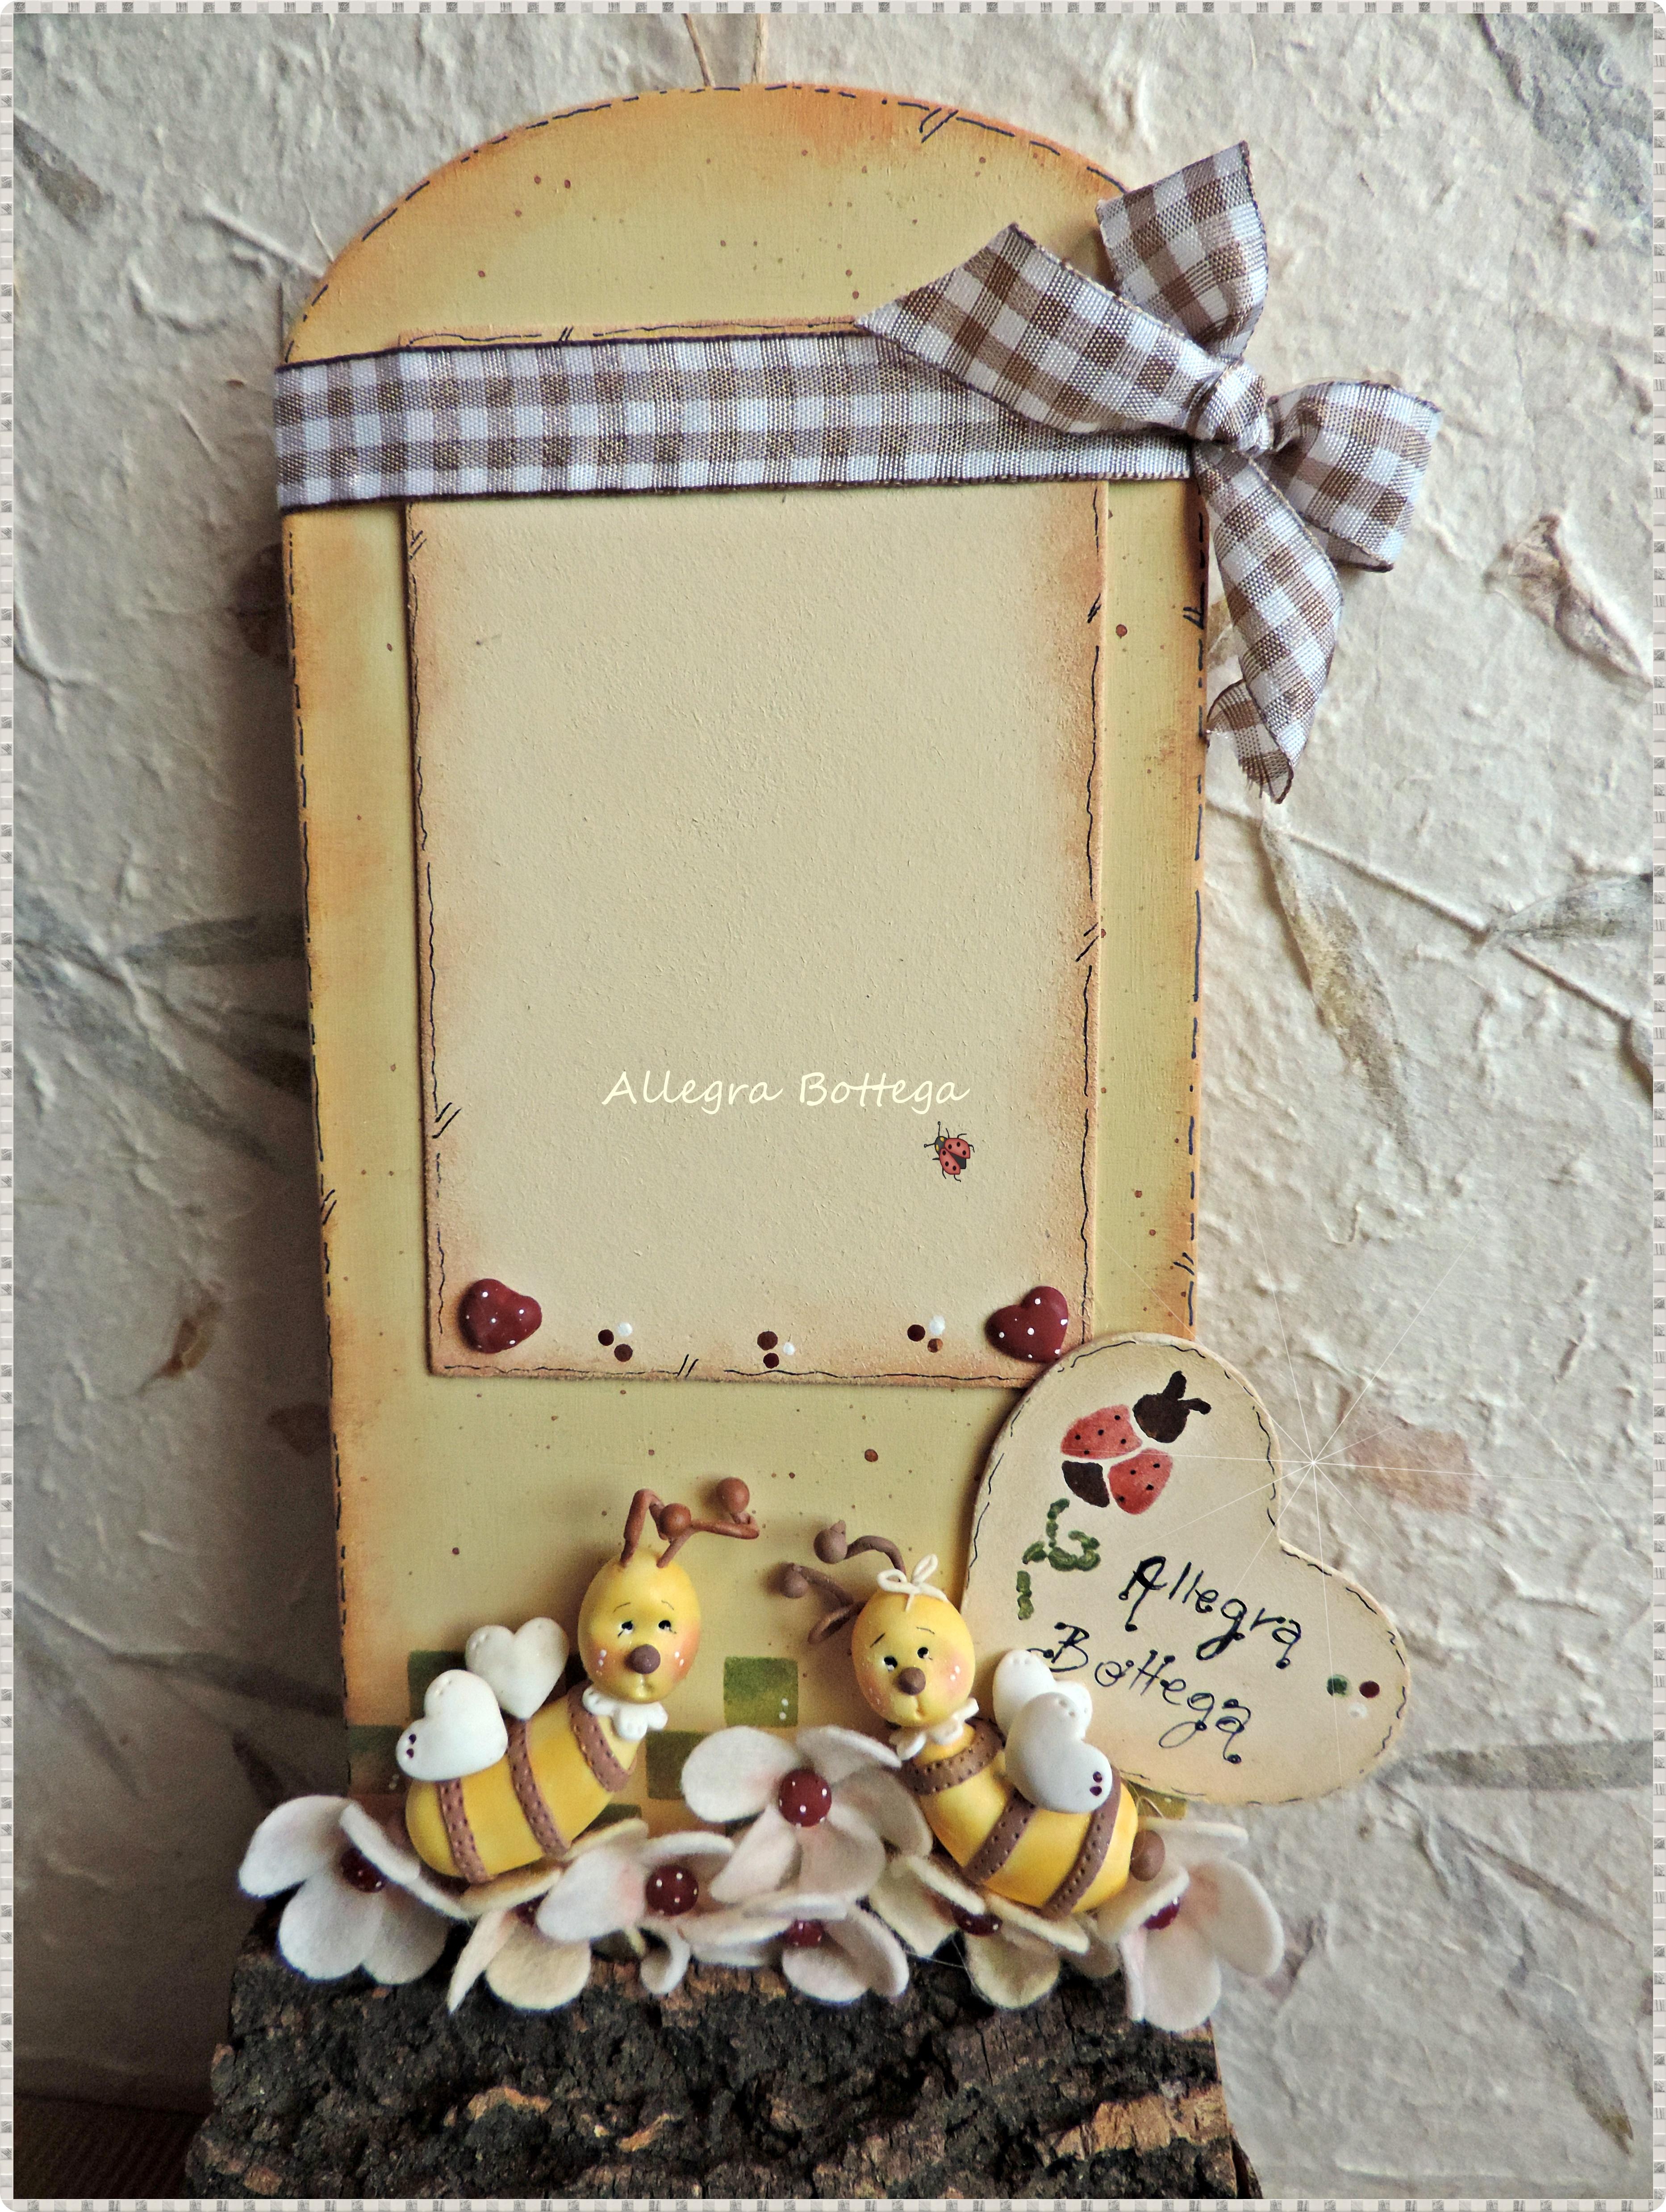 Le piccole apine